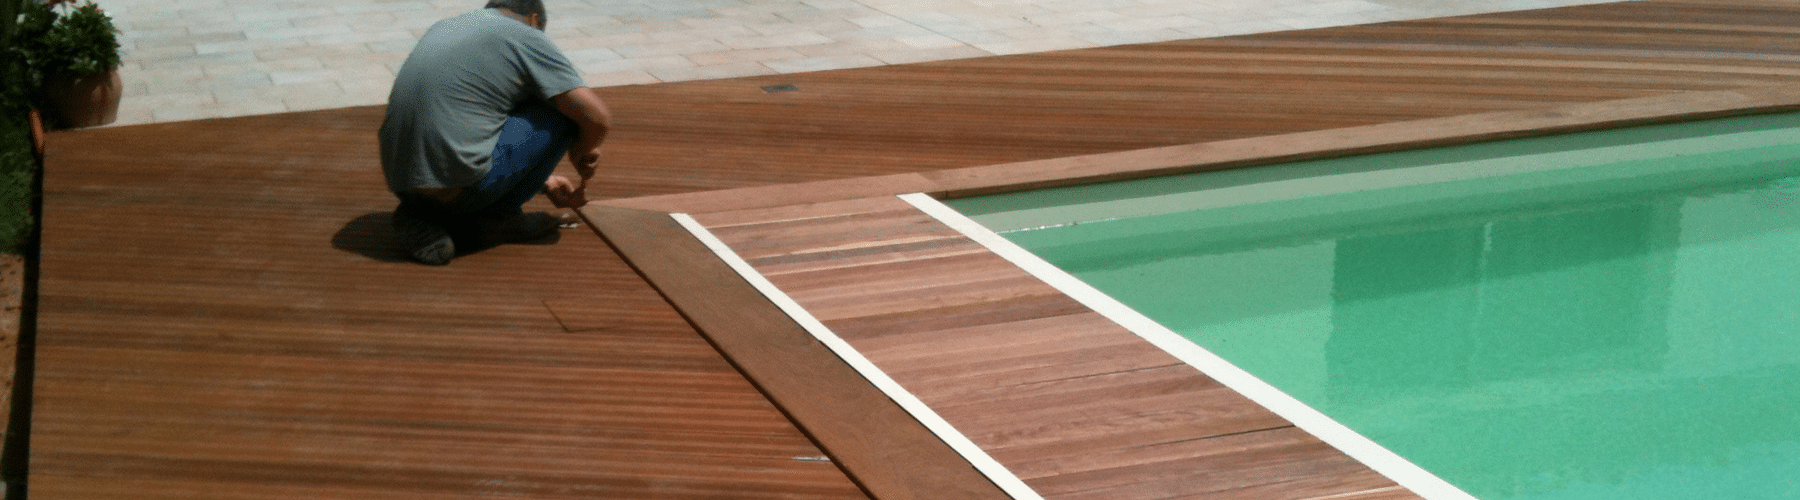 construire une terrasse en bois